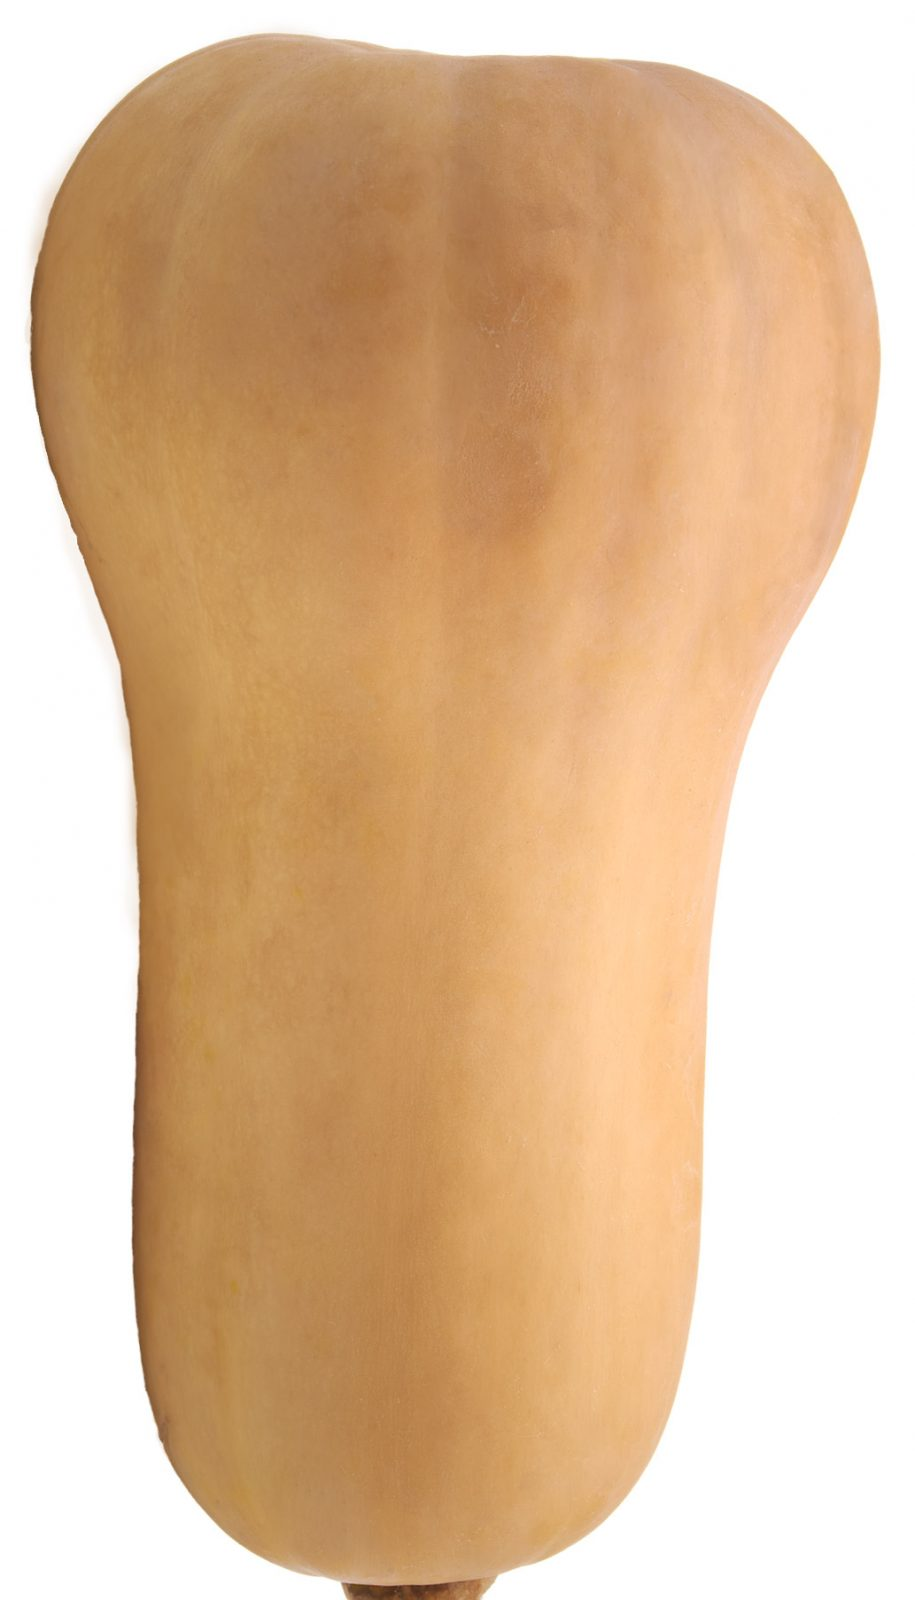 gourd shaped like male genitals